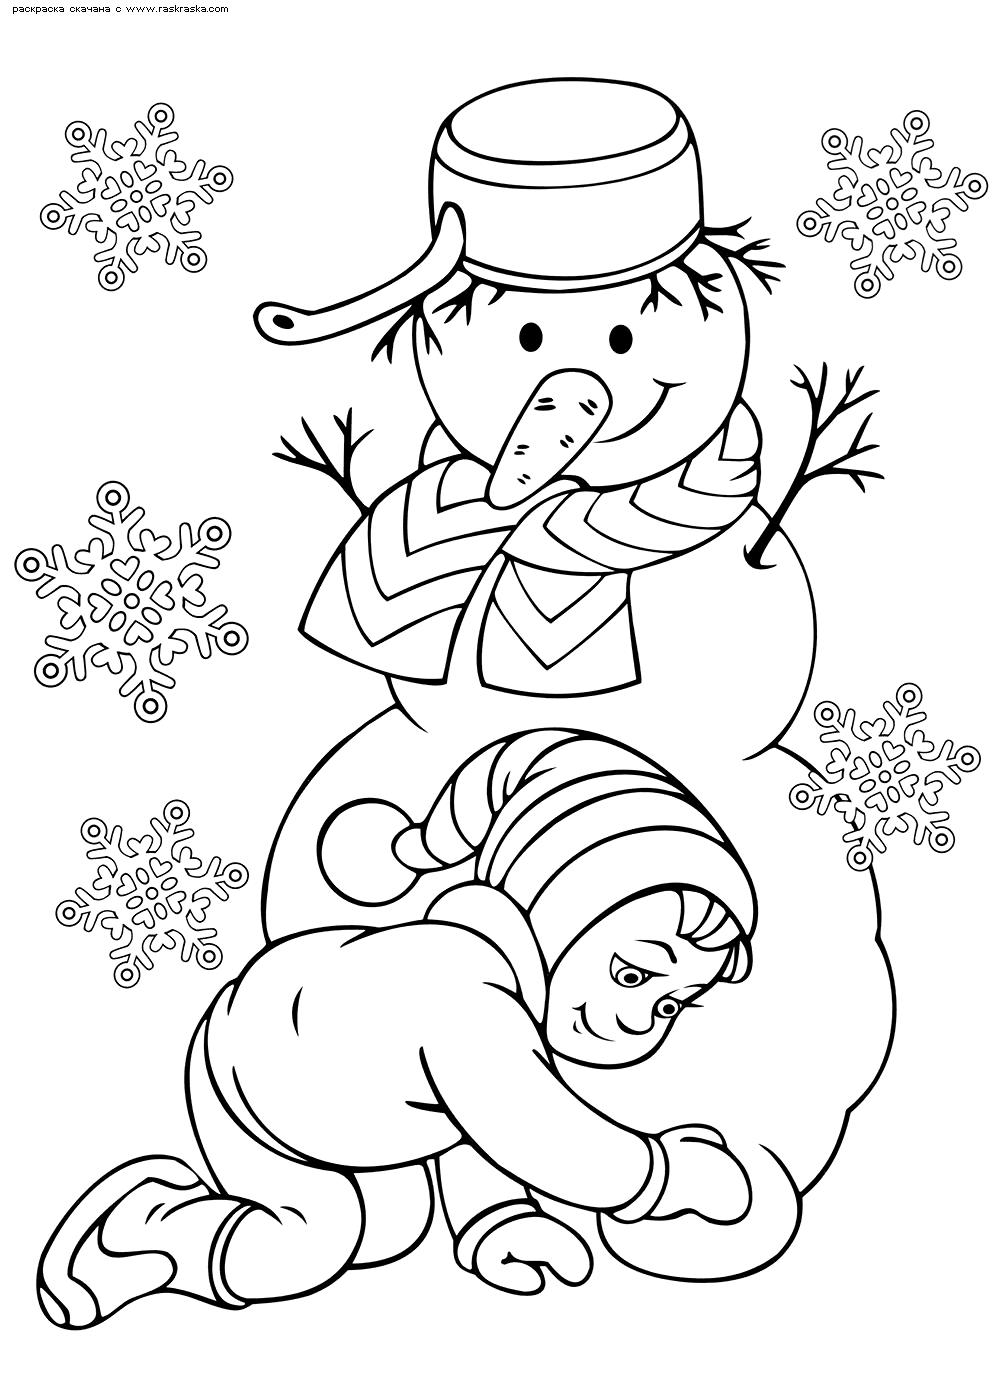 Раскраска Девочка лепит Снеговика. Раскраска снеговик, зима